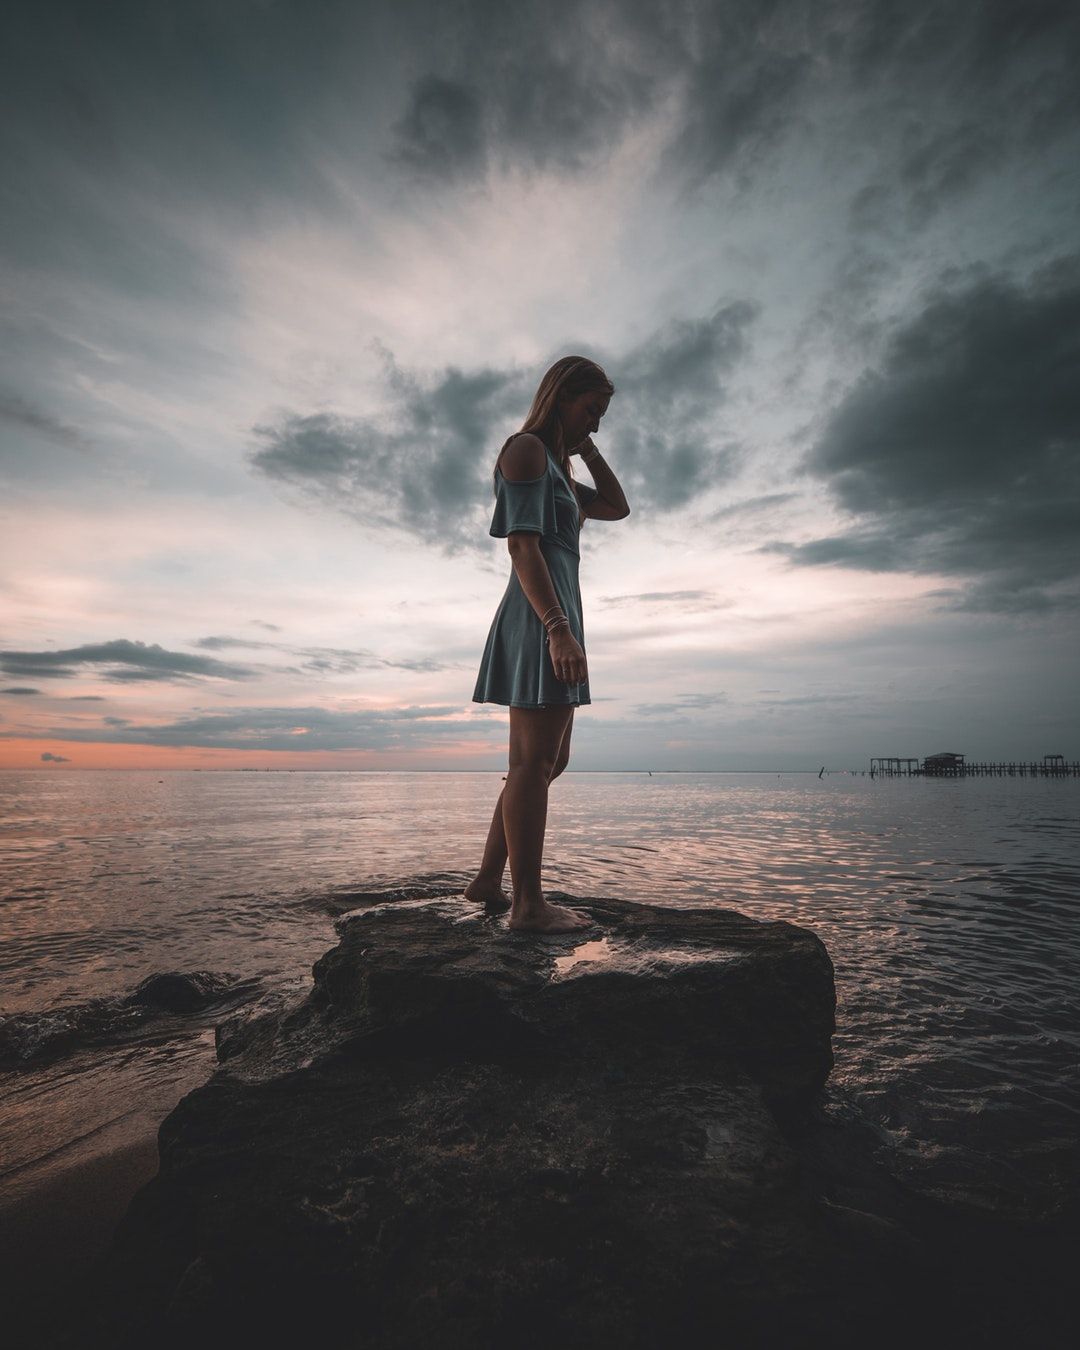 woman standing on rock near body of water